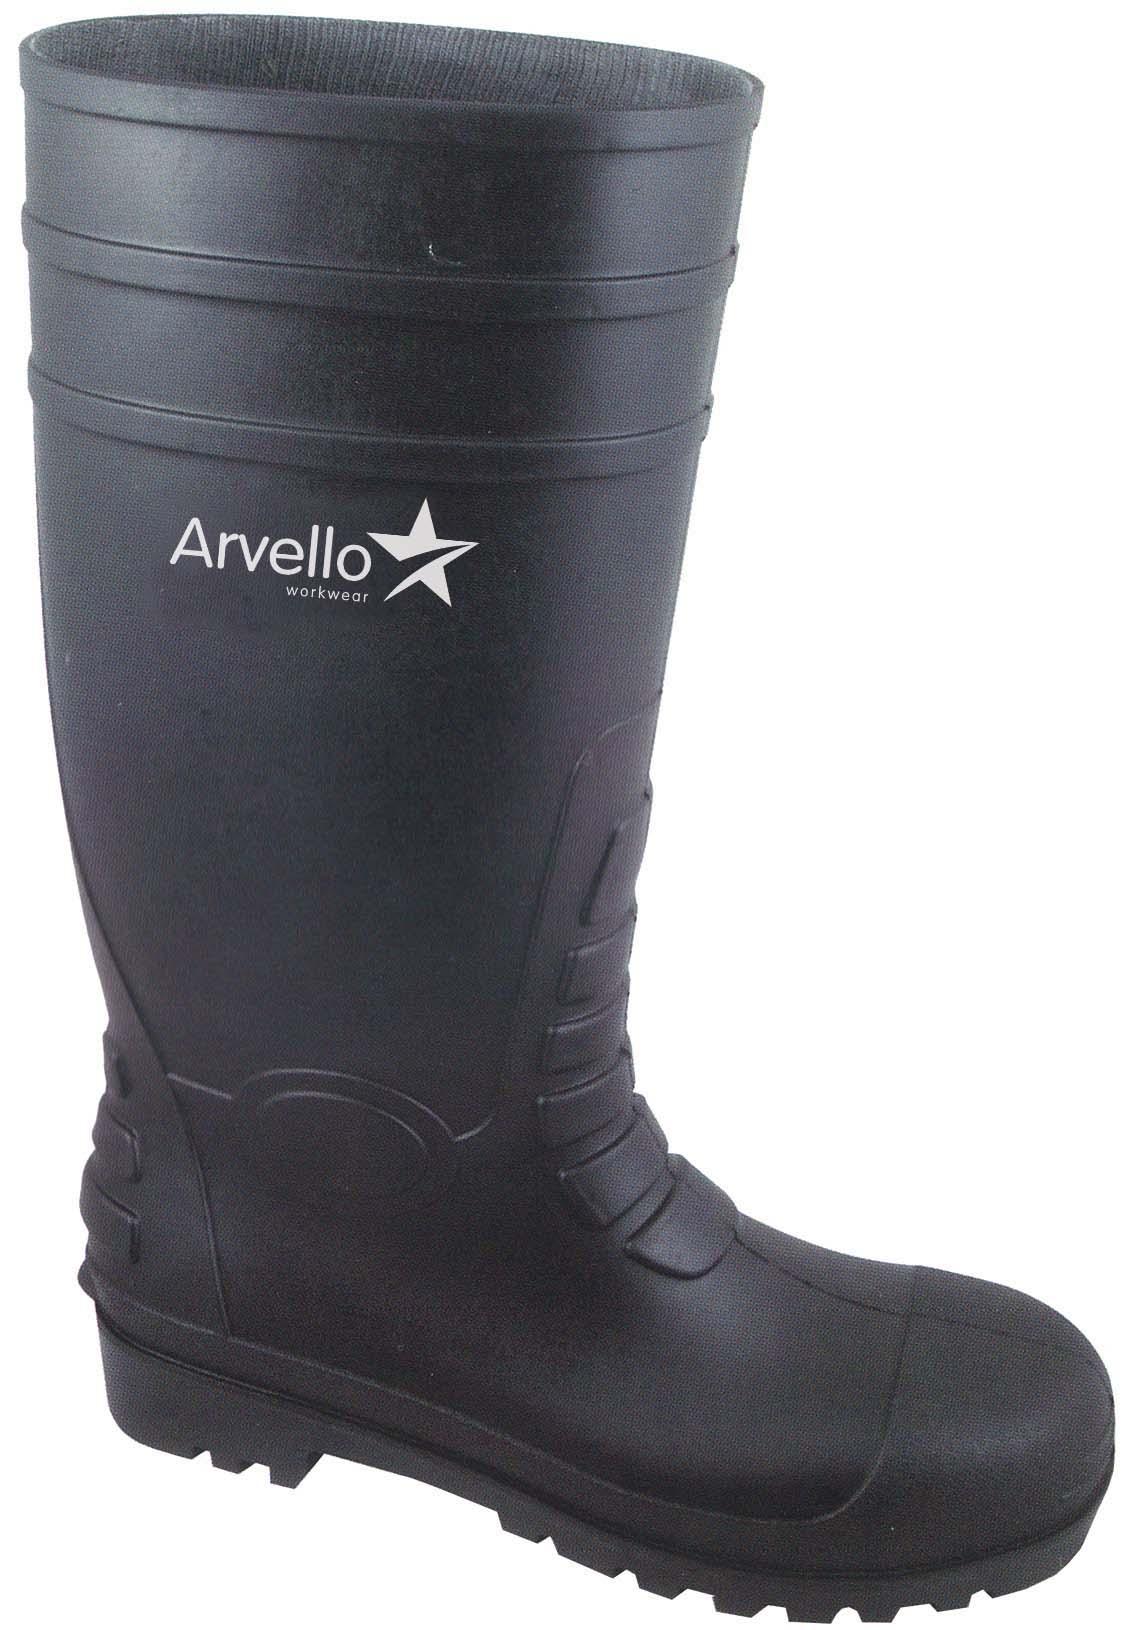 ABC Steel Toe Wellington Boots Size 8